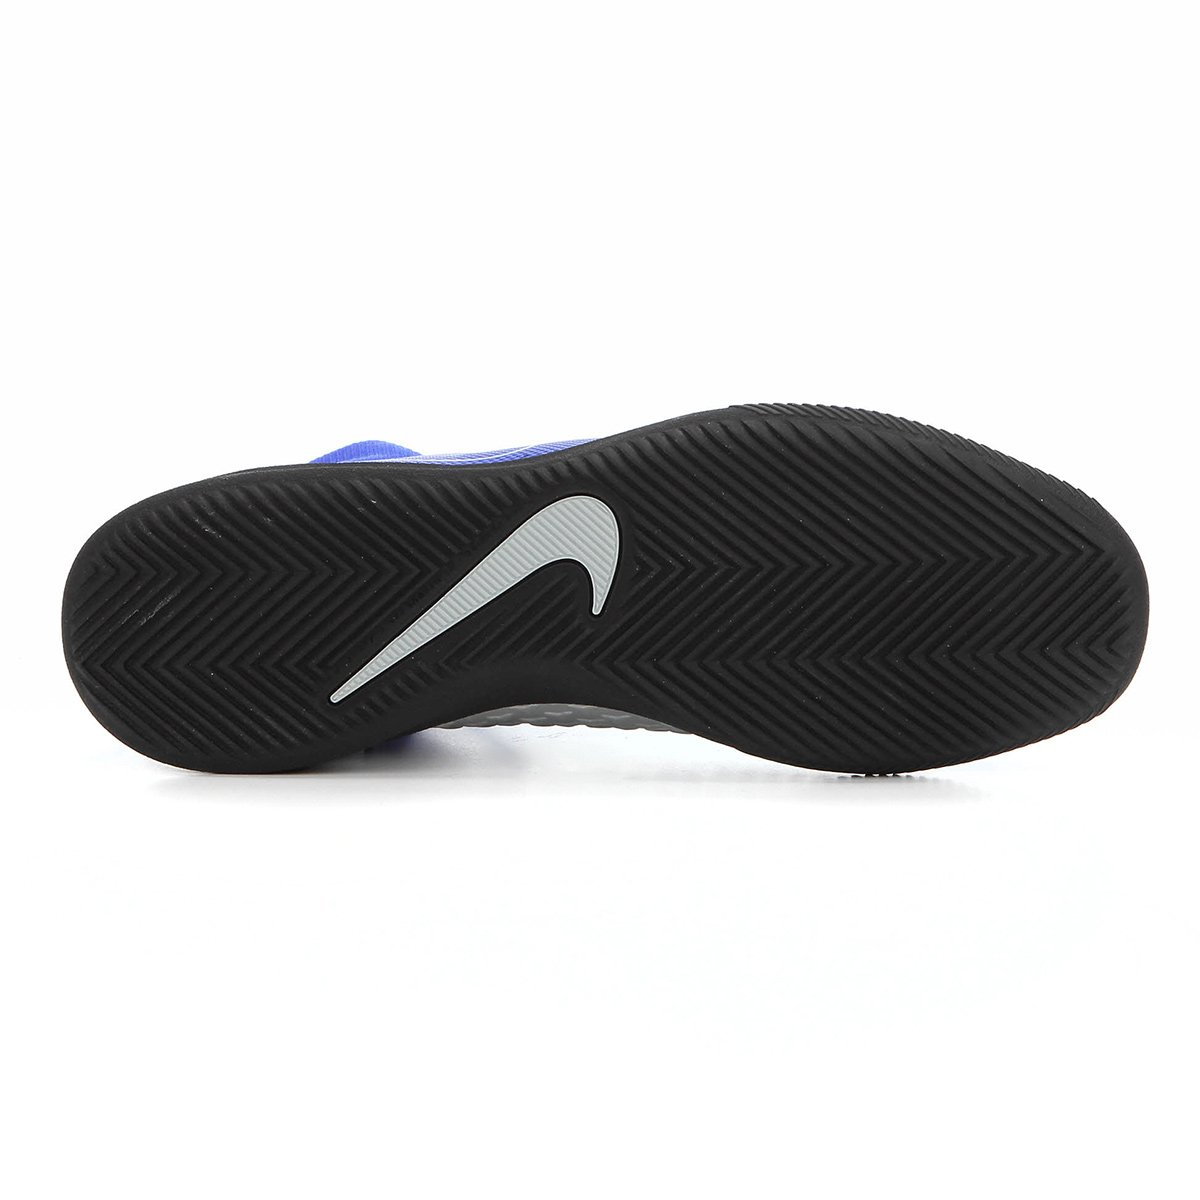 Chuteira Futsal Nike Phantom Vision Club DF IC - Azul - Compre Agora ... 45fd3d452205a